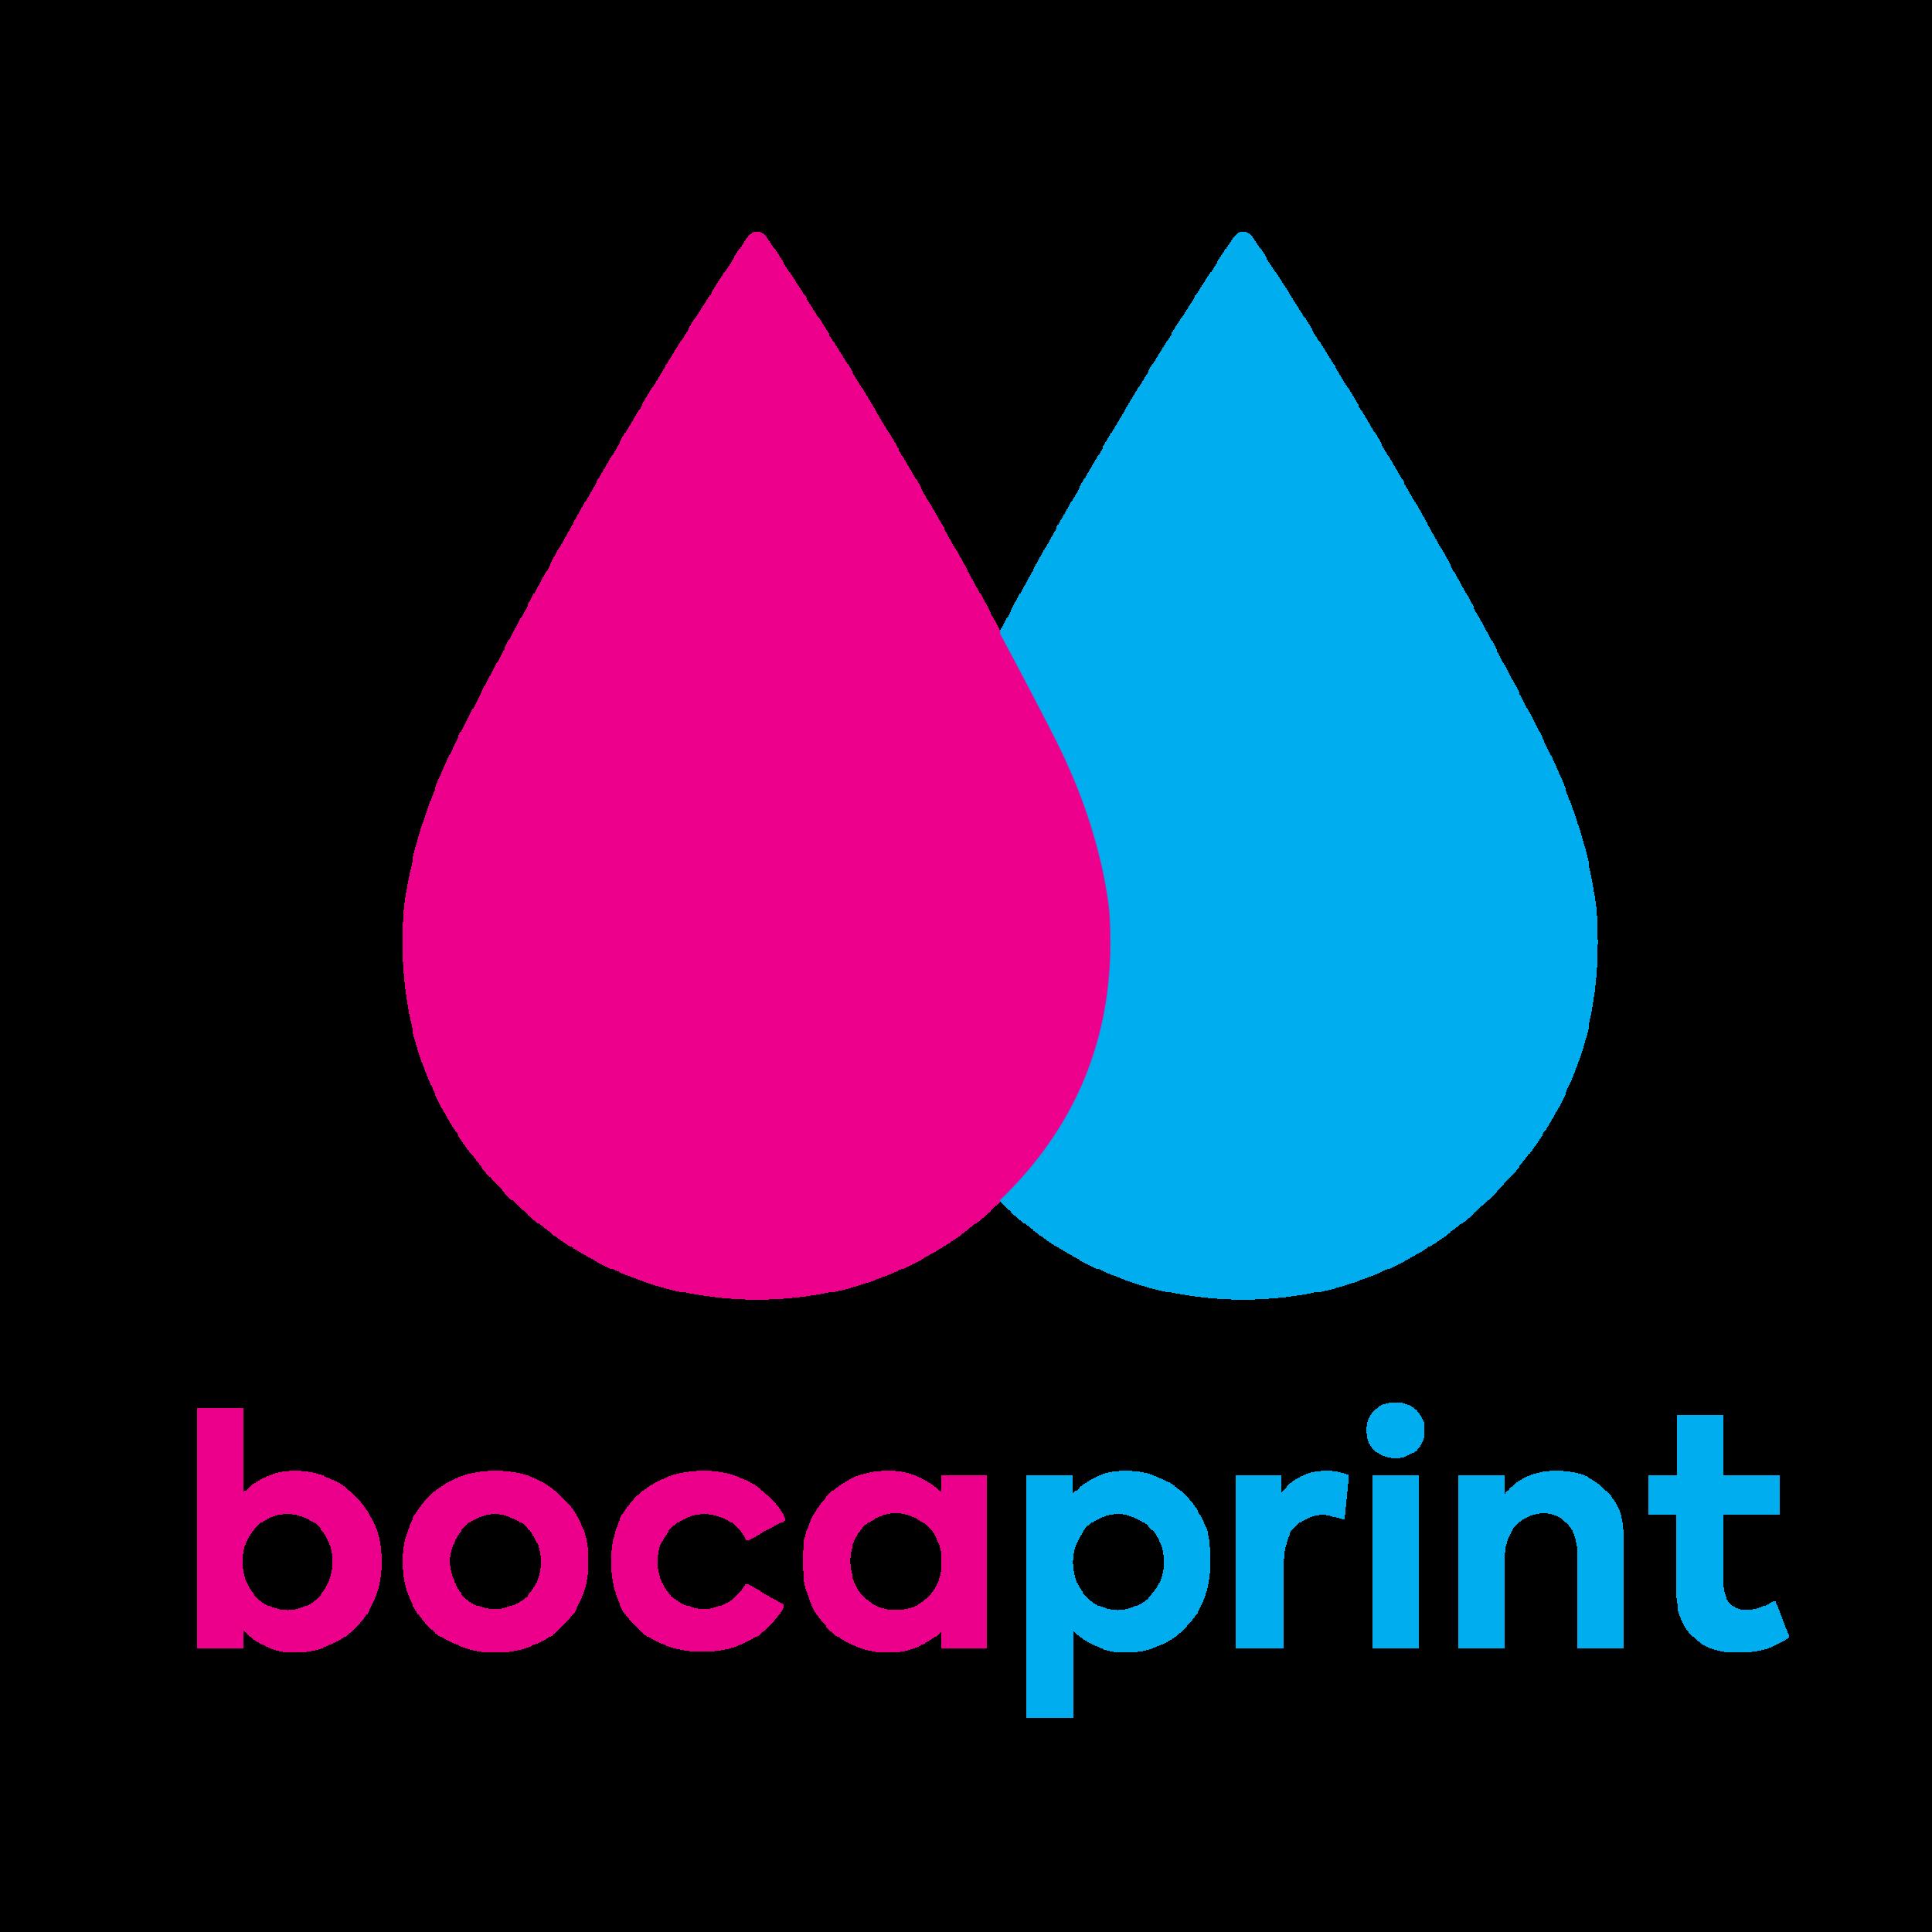 BOCAPRINT_LOGO_FINAL-01.png